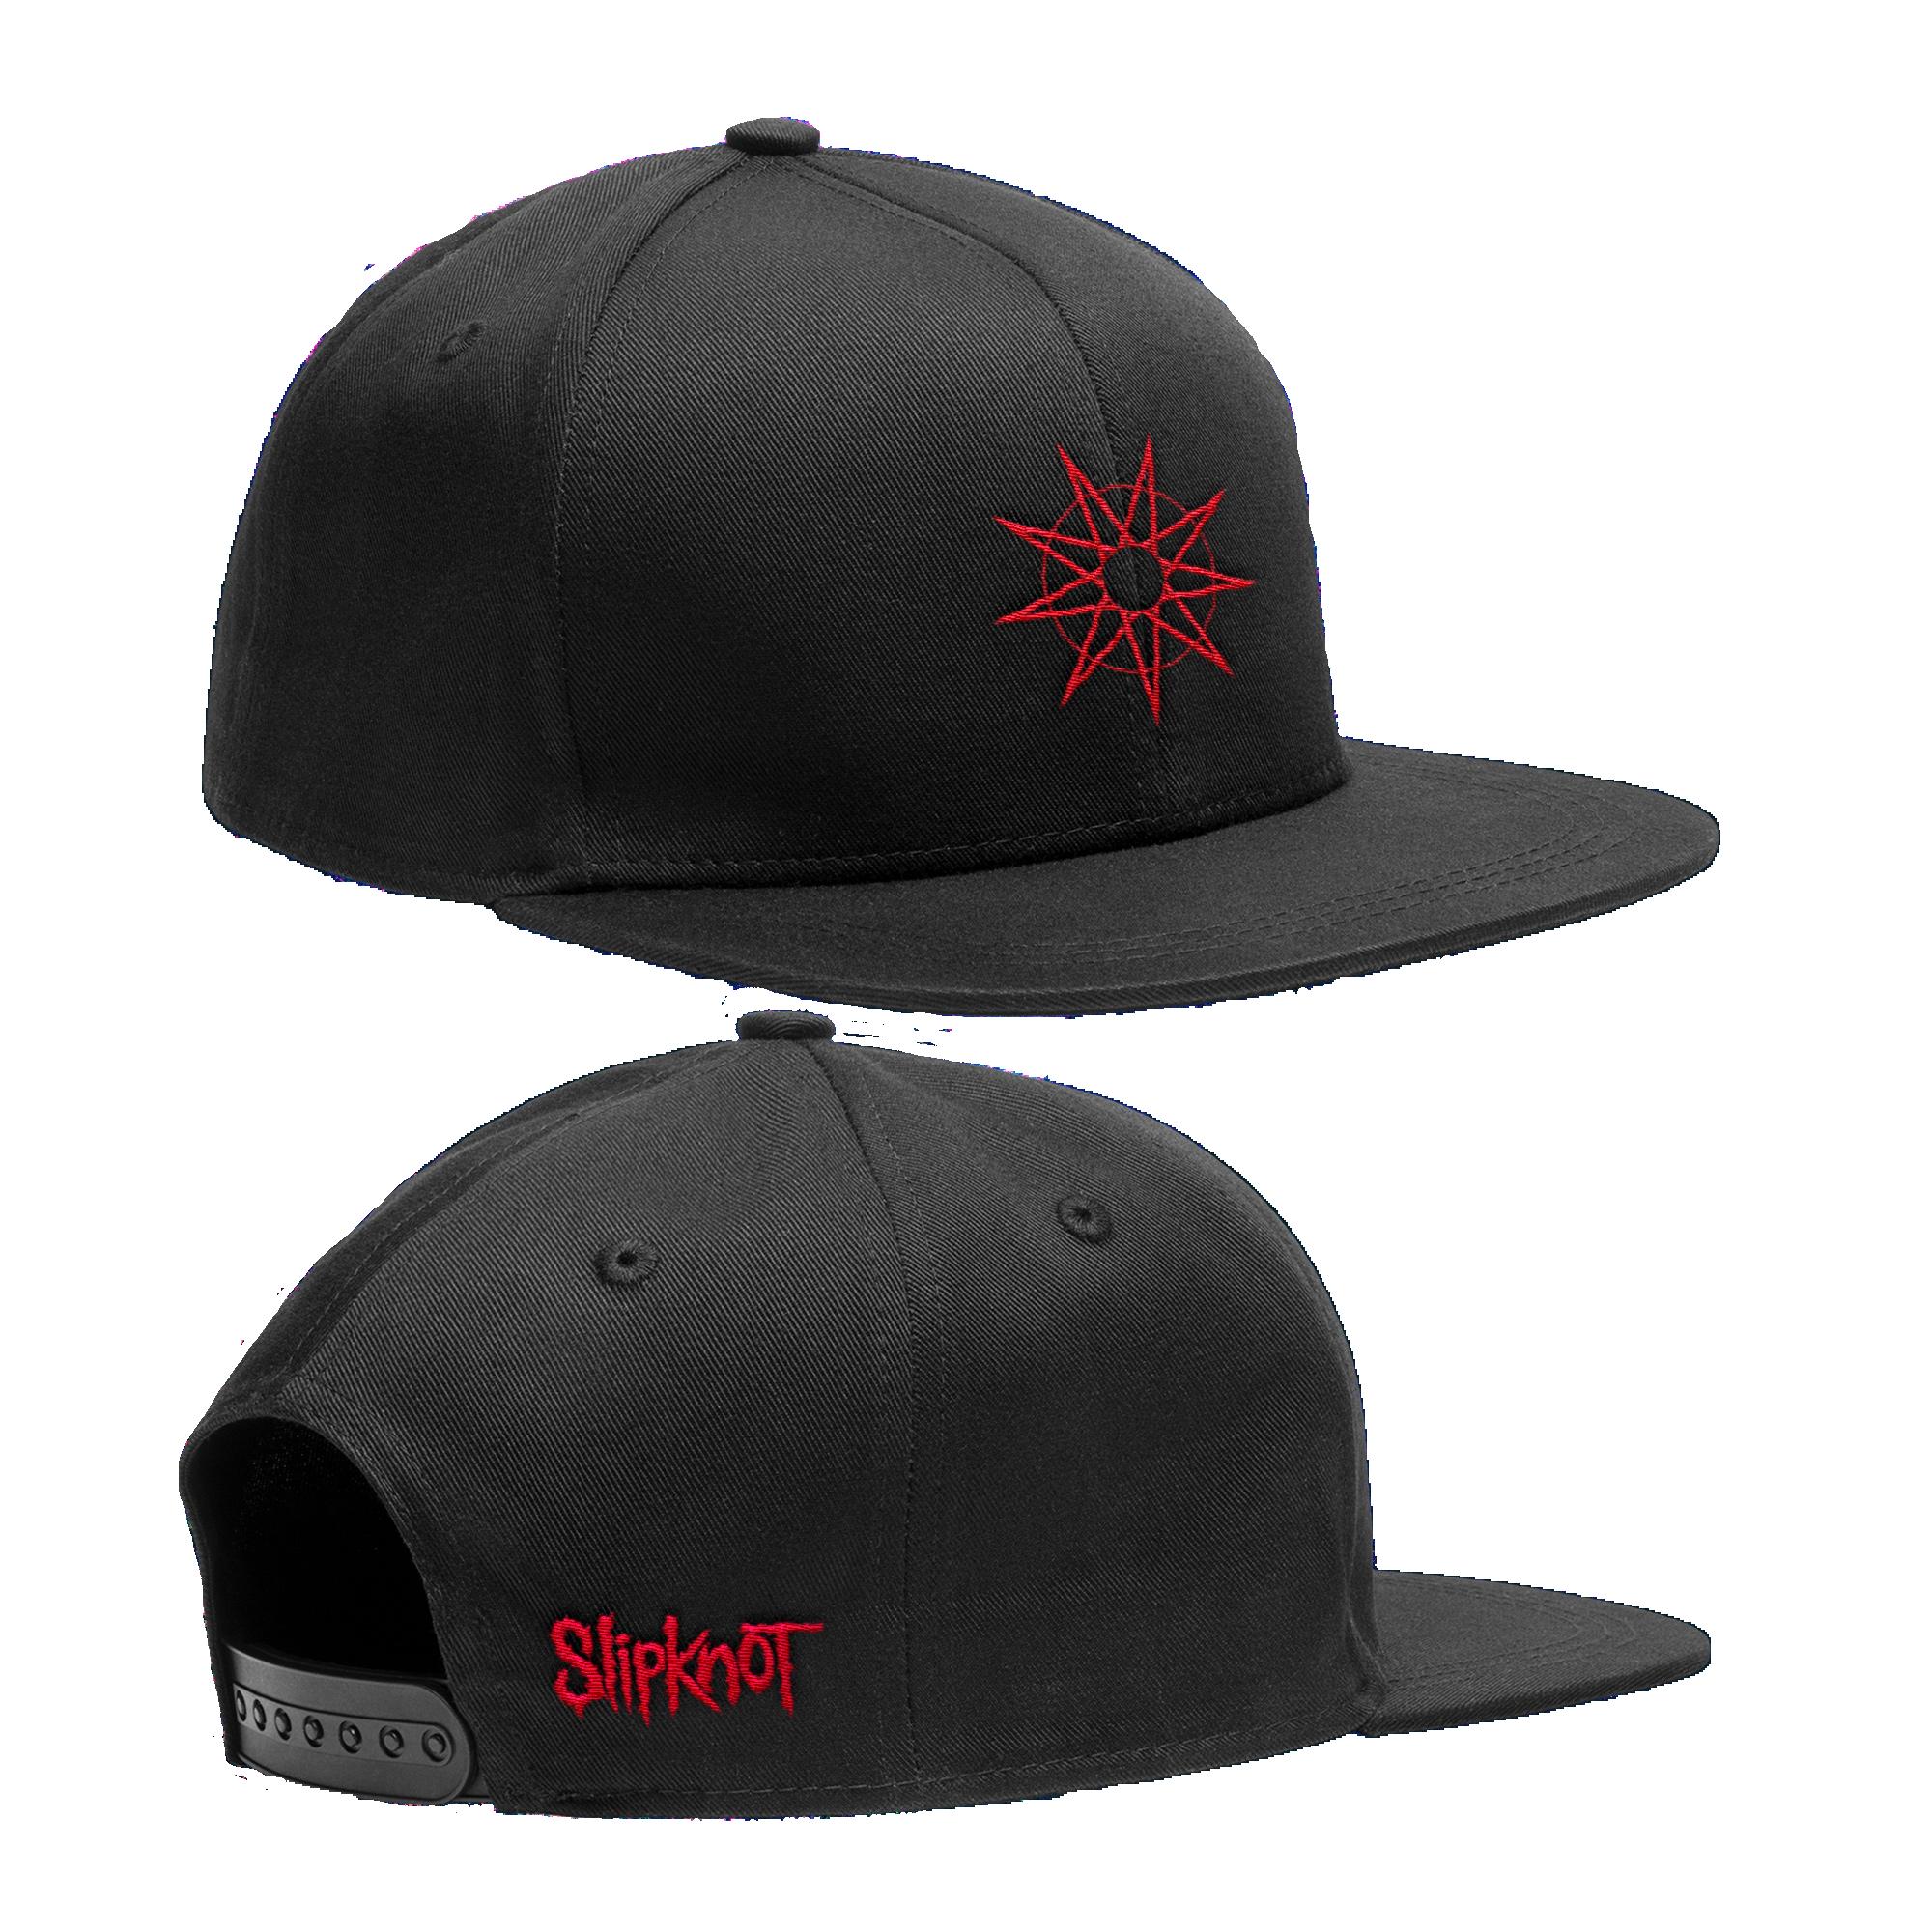 OT9 RED STAR HAT 001